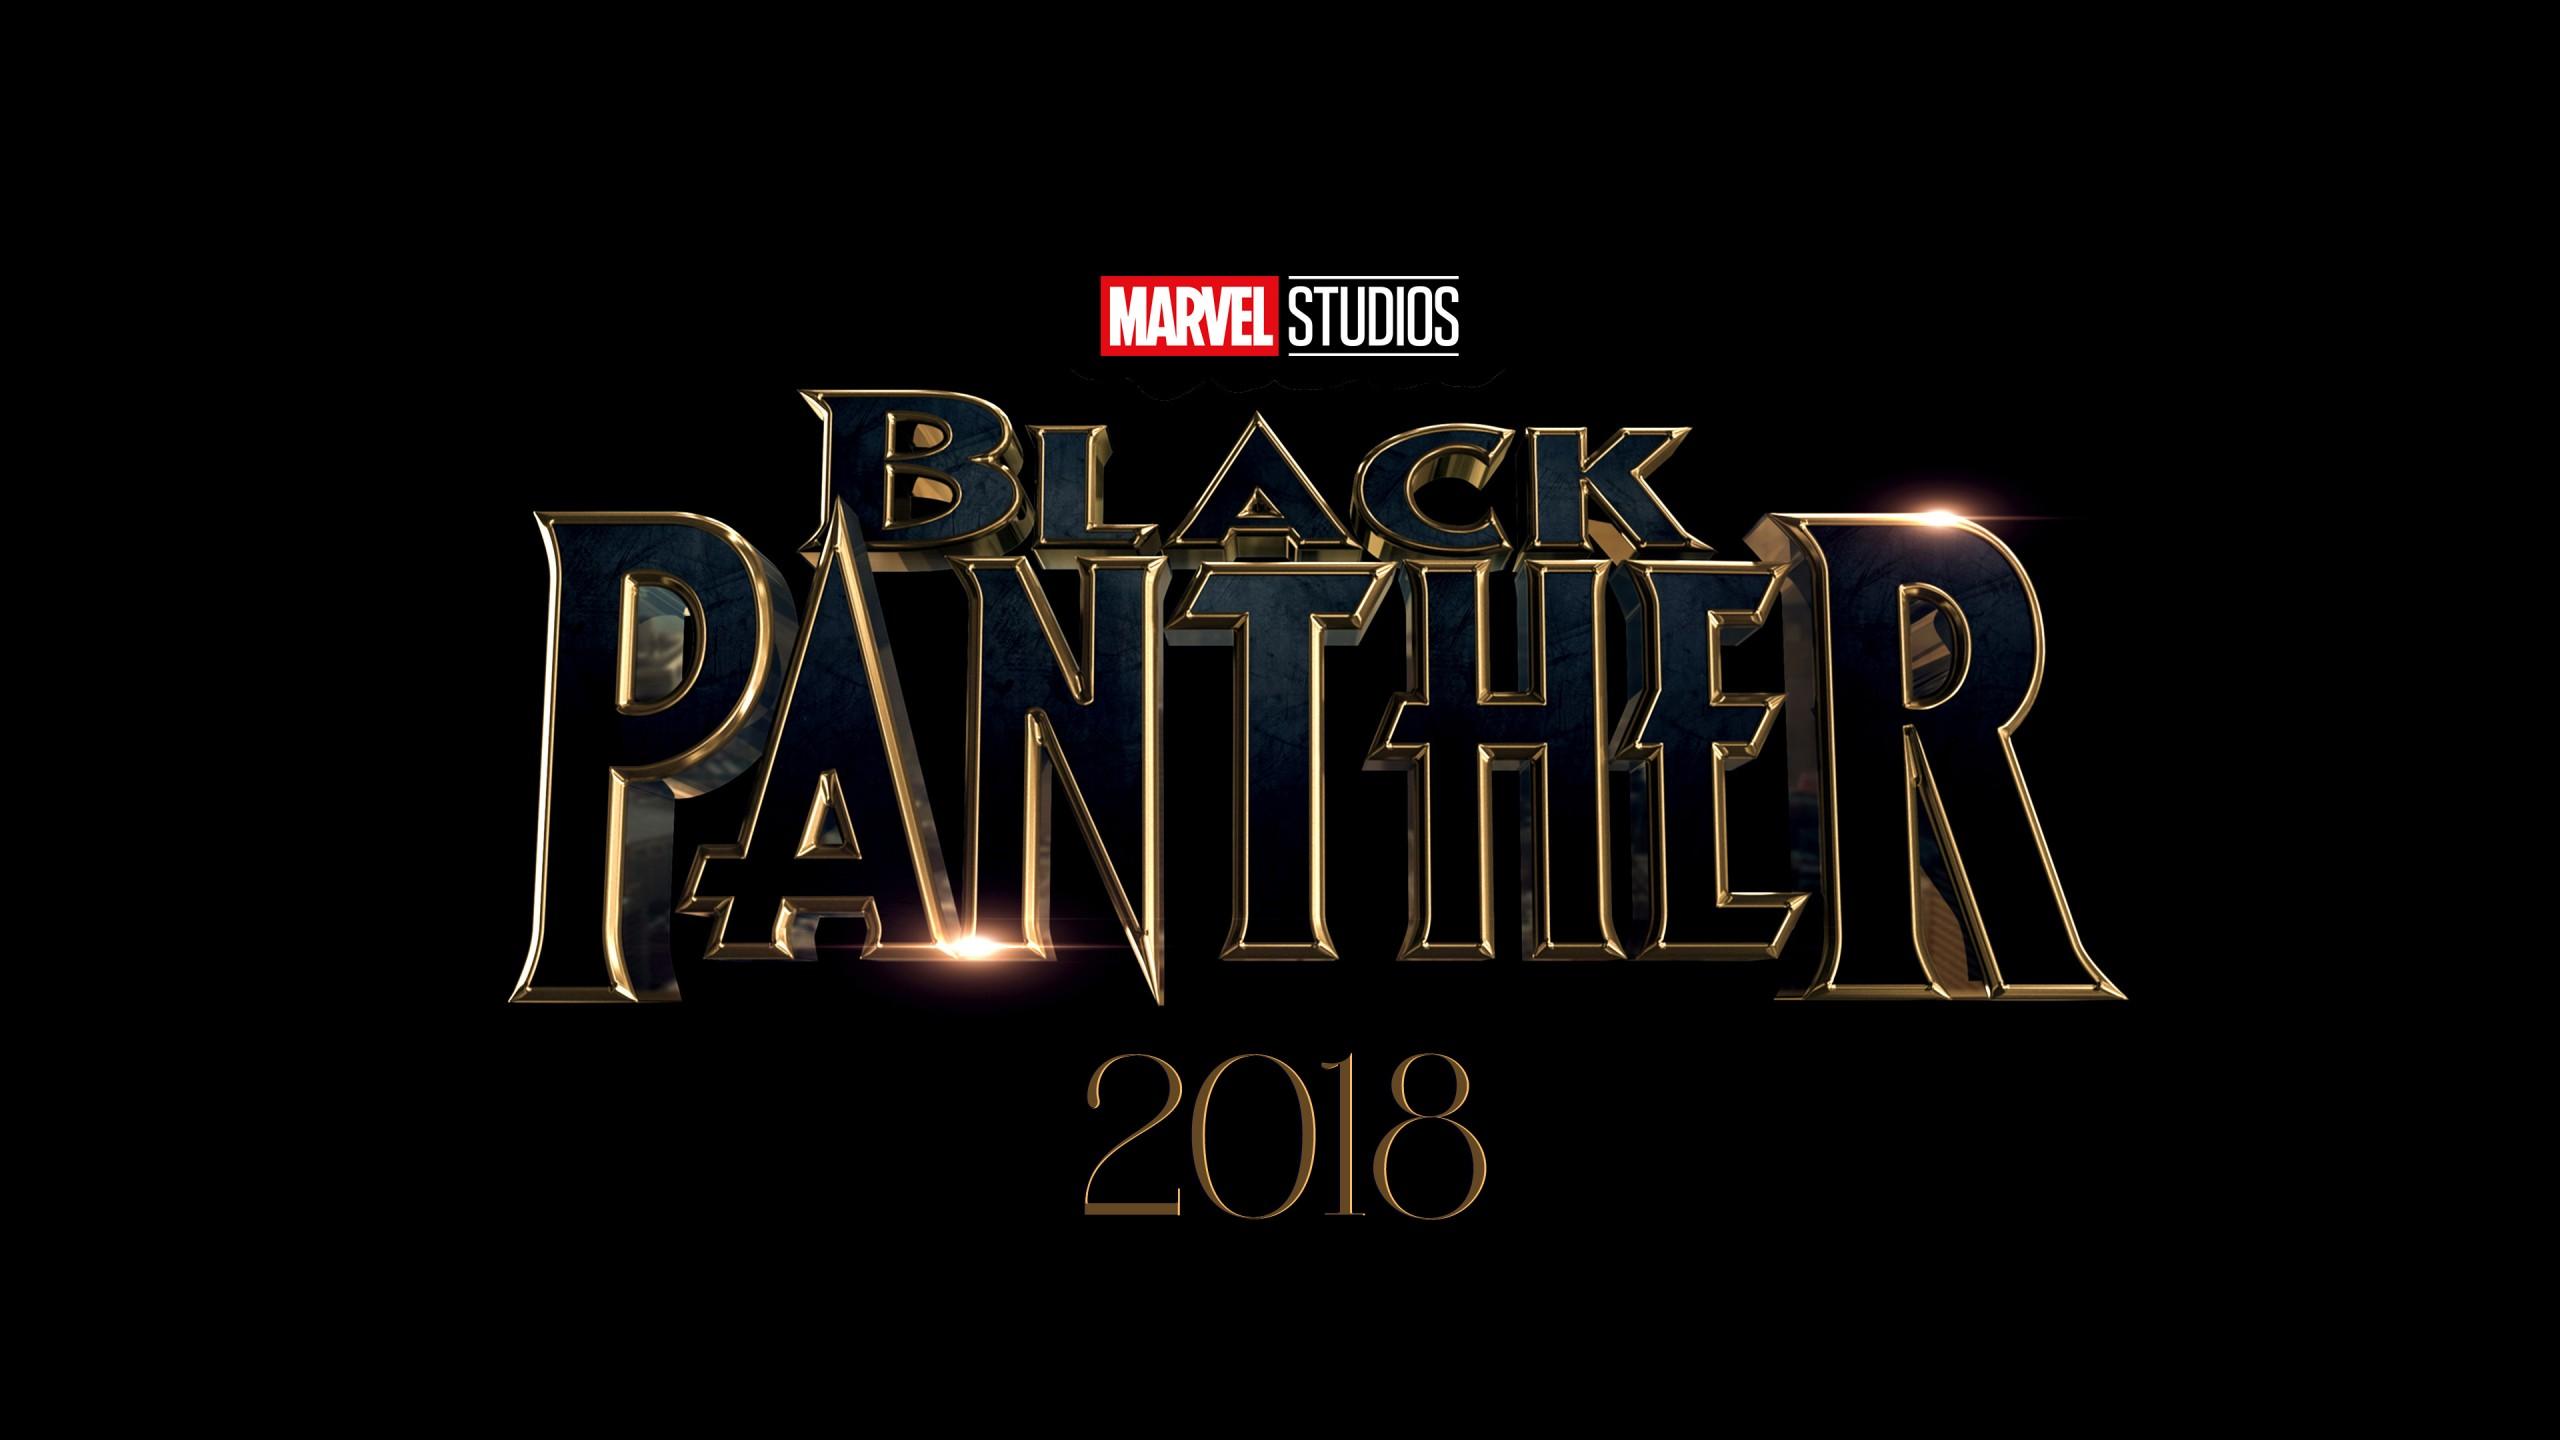 black panther movie logo wallpaper background 62054